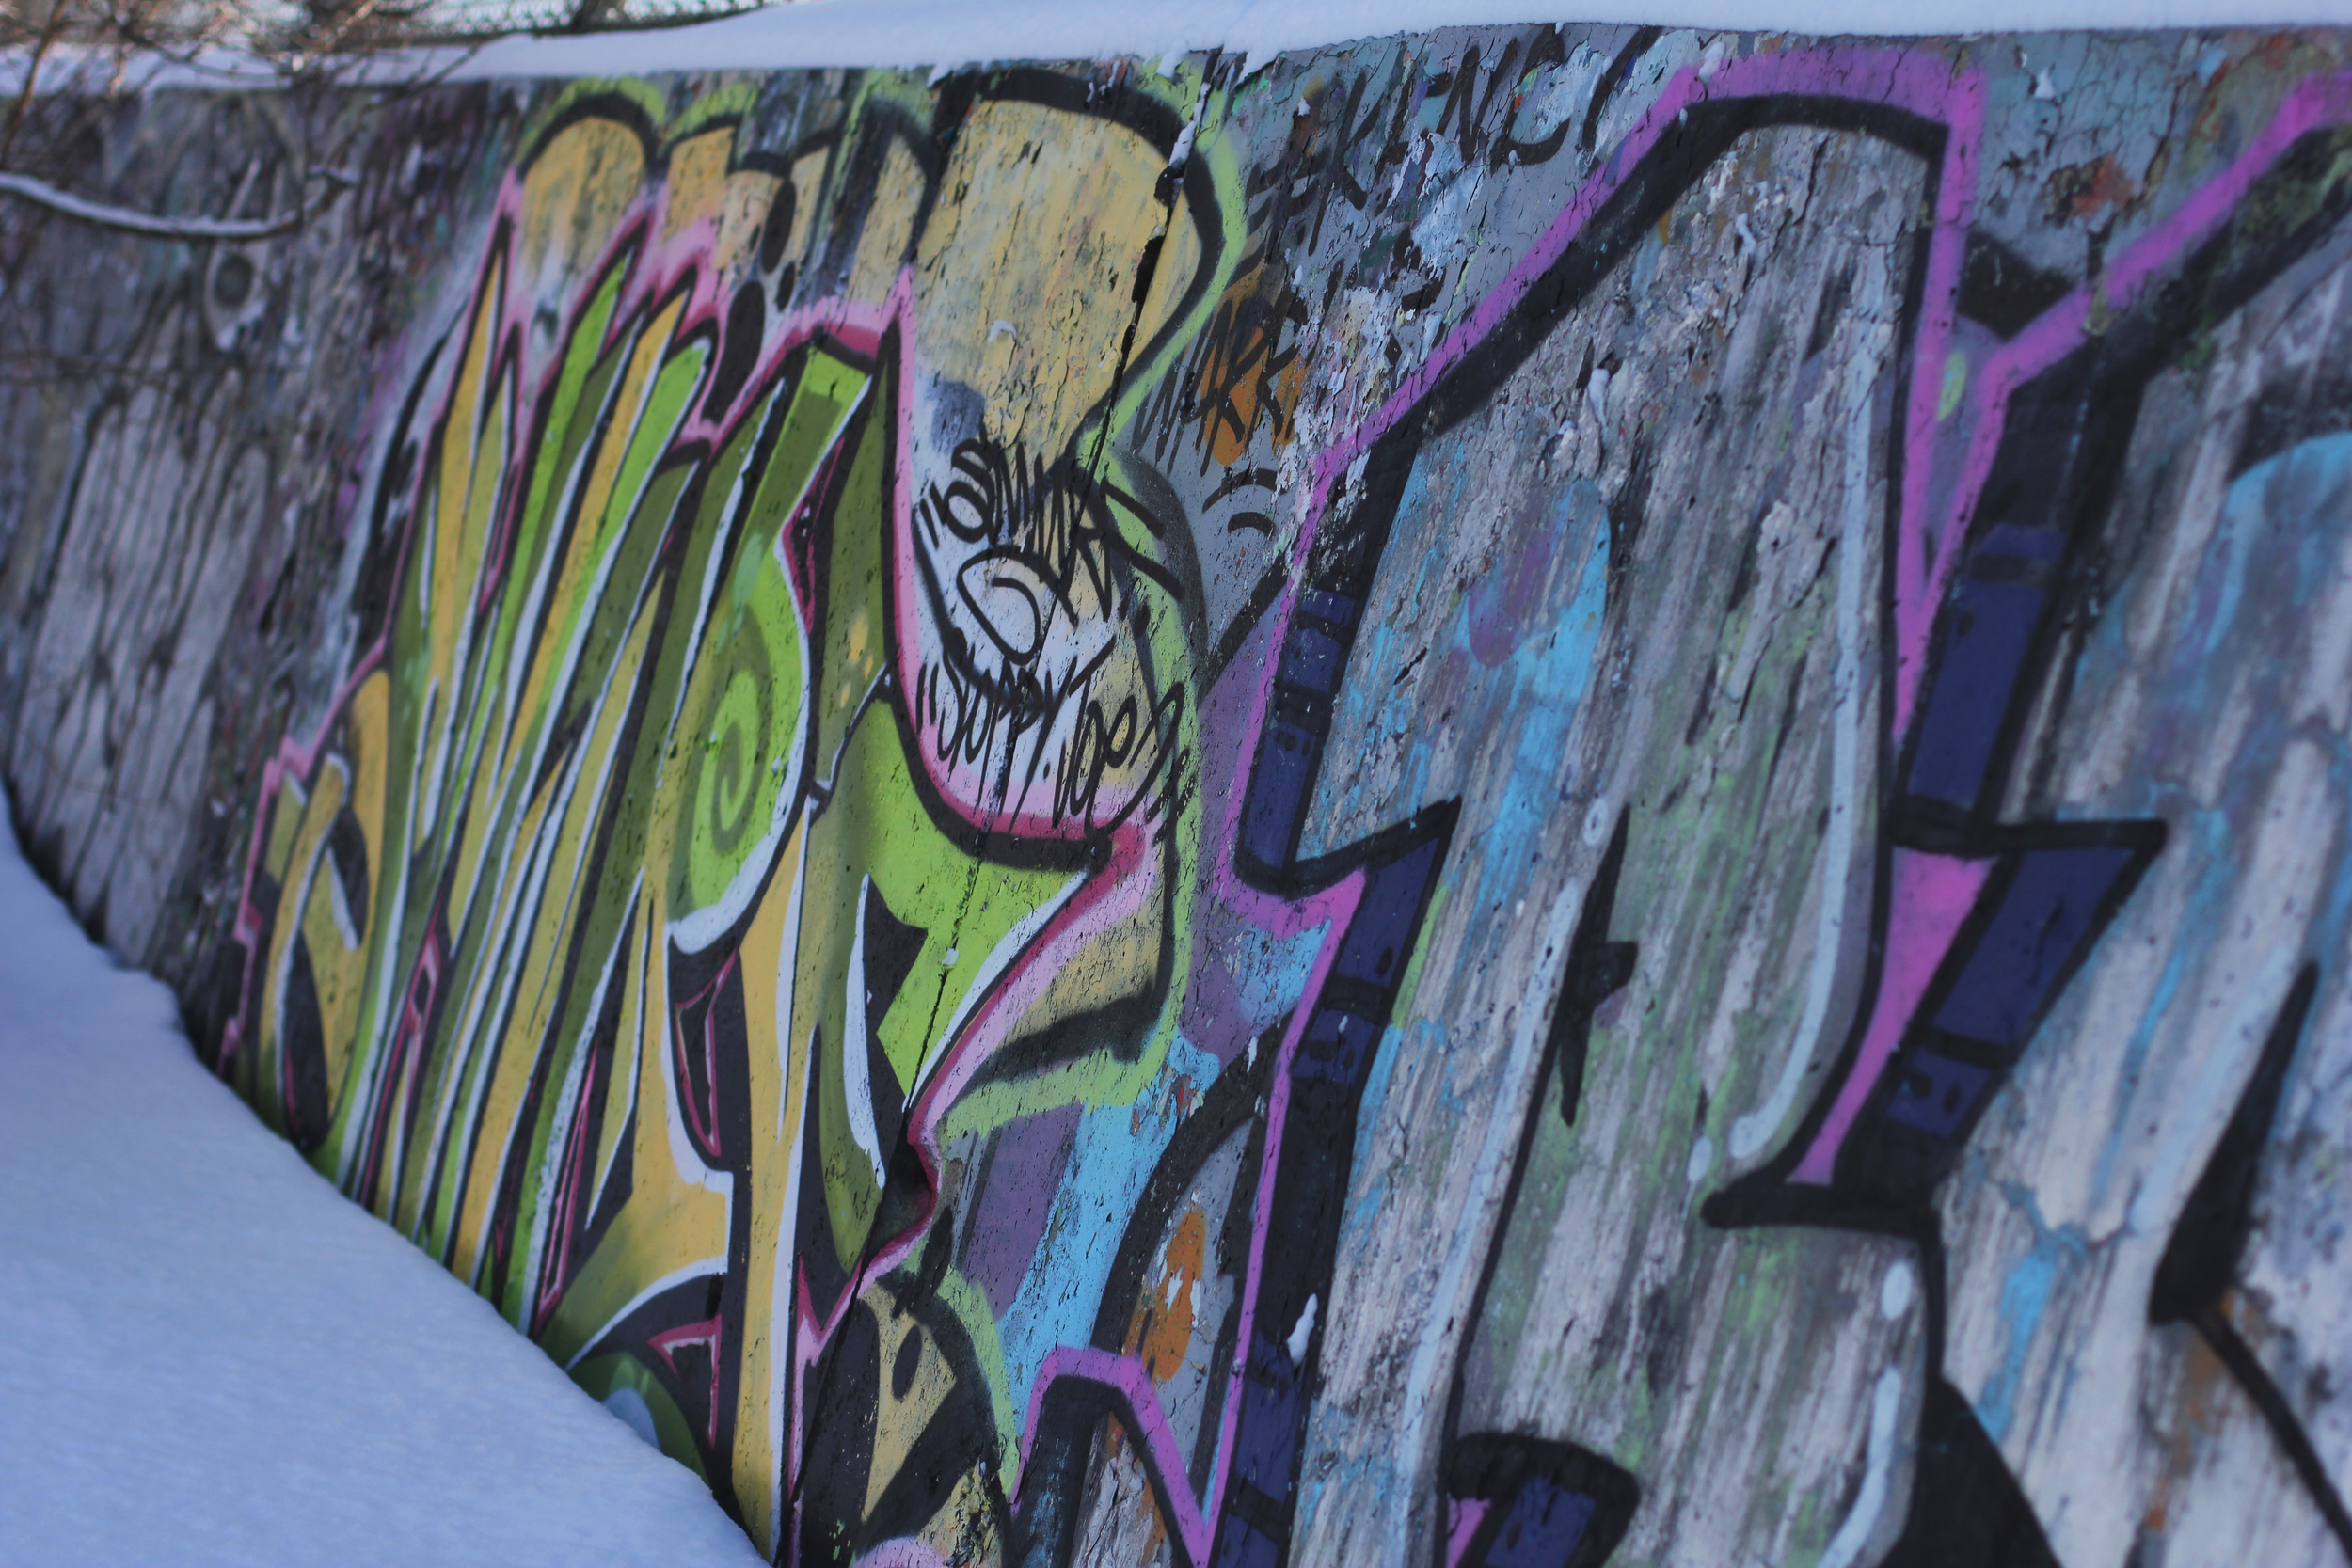 *graffitiwall.jpg